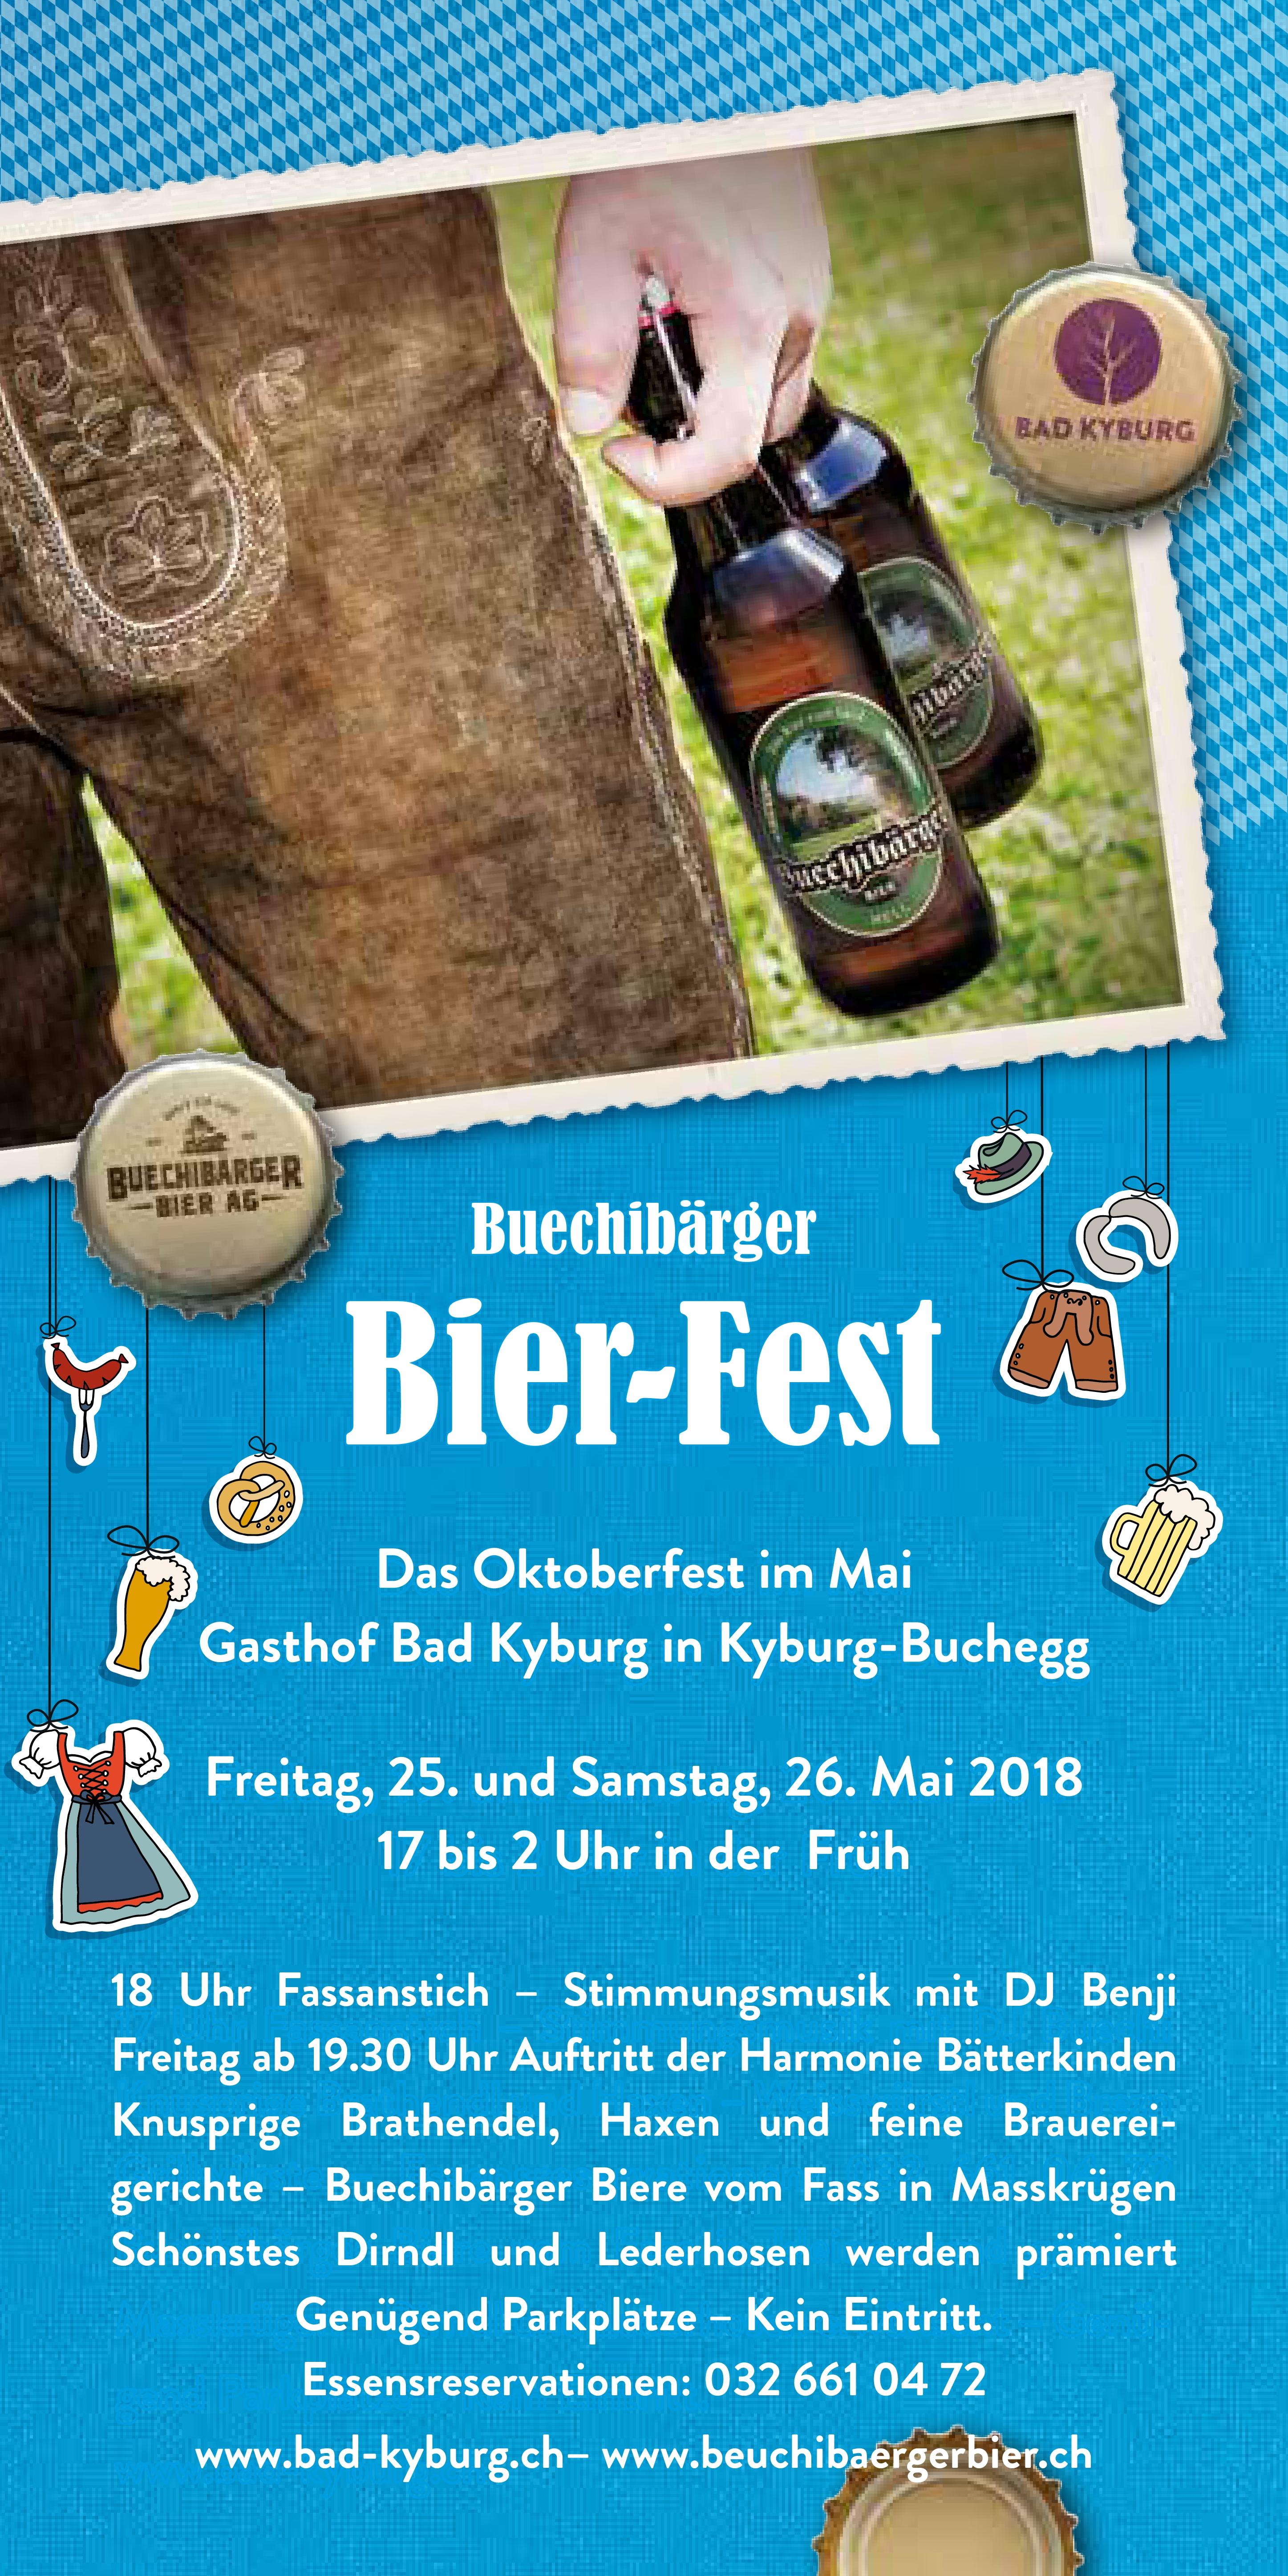 Buechibärger Bier-Fest 25.& 26.05.2018